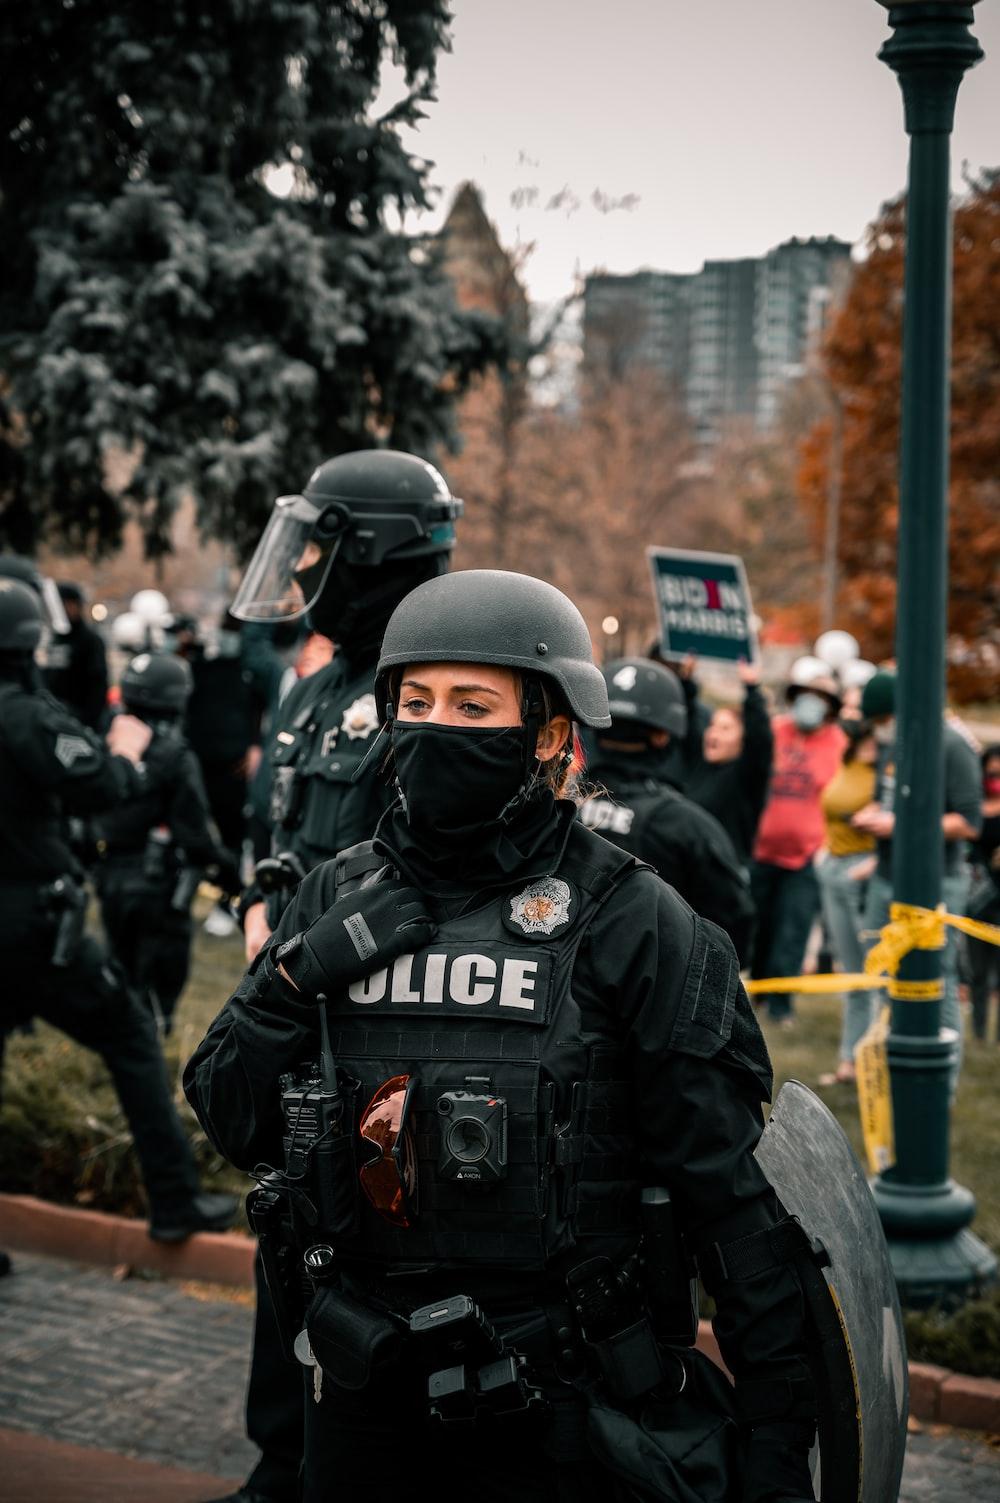 man in black helmet and black jacket standing near people during daytime